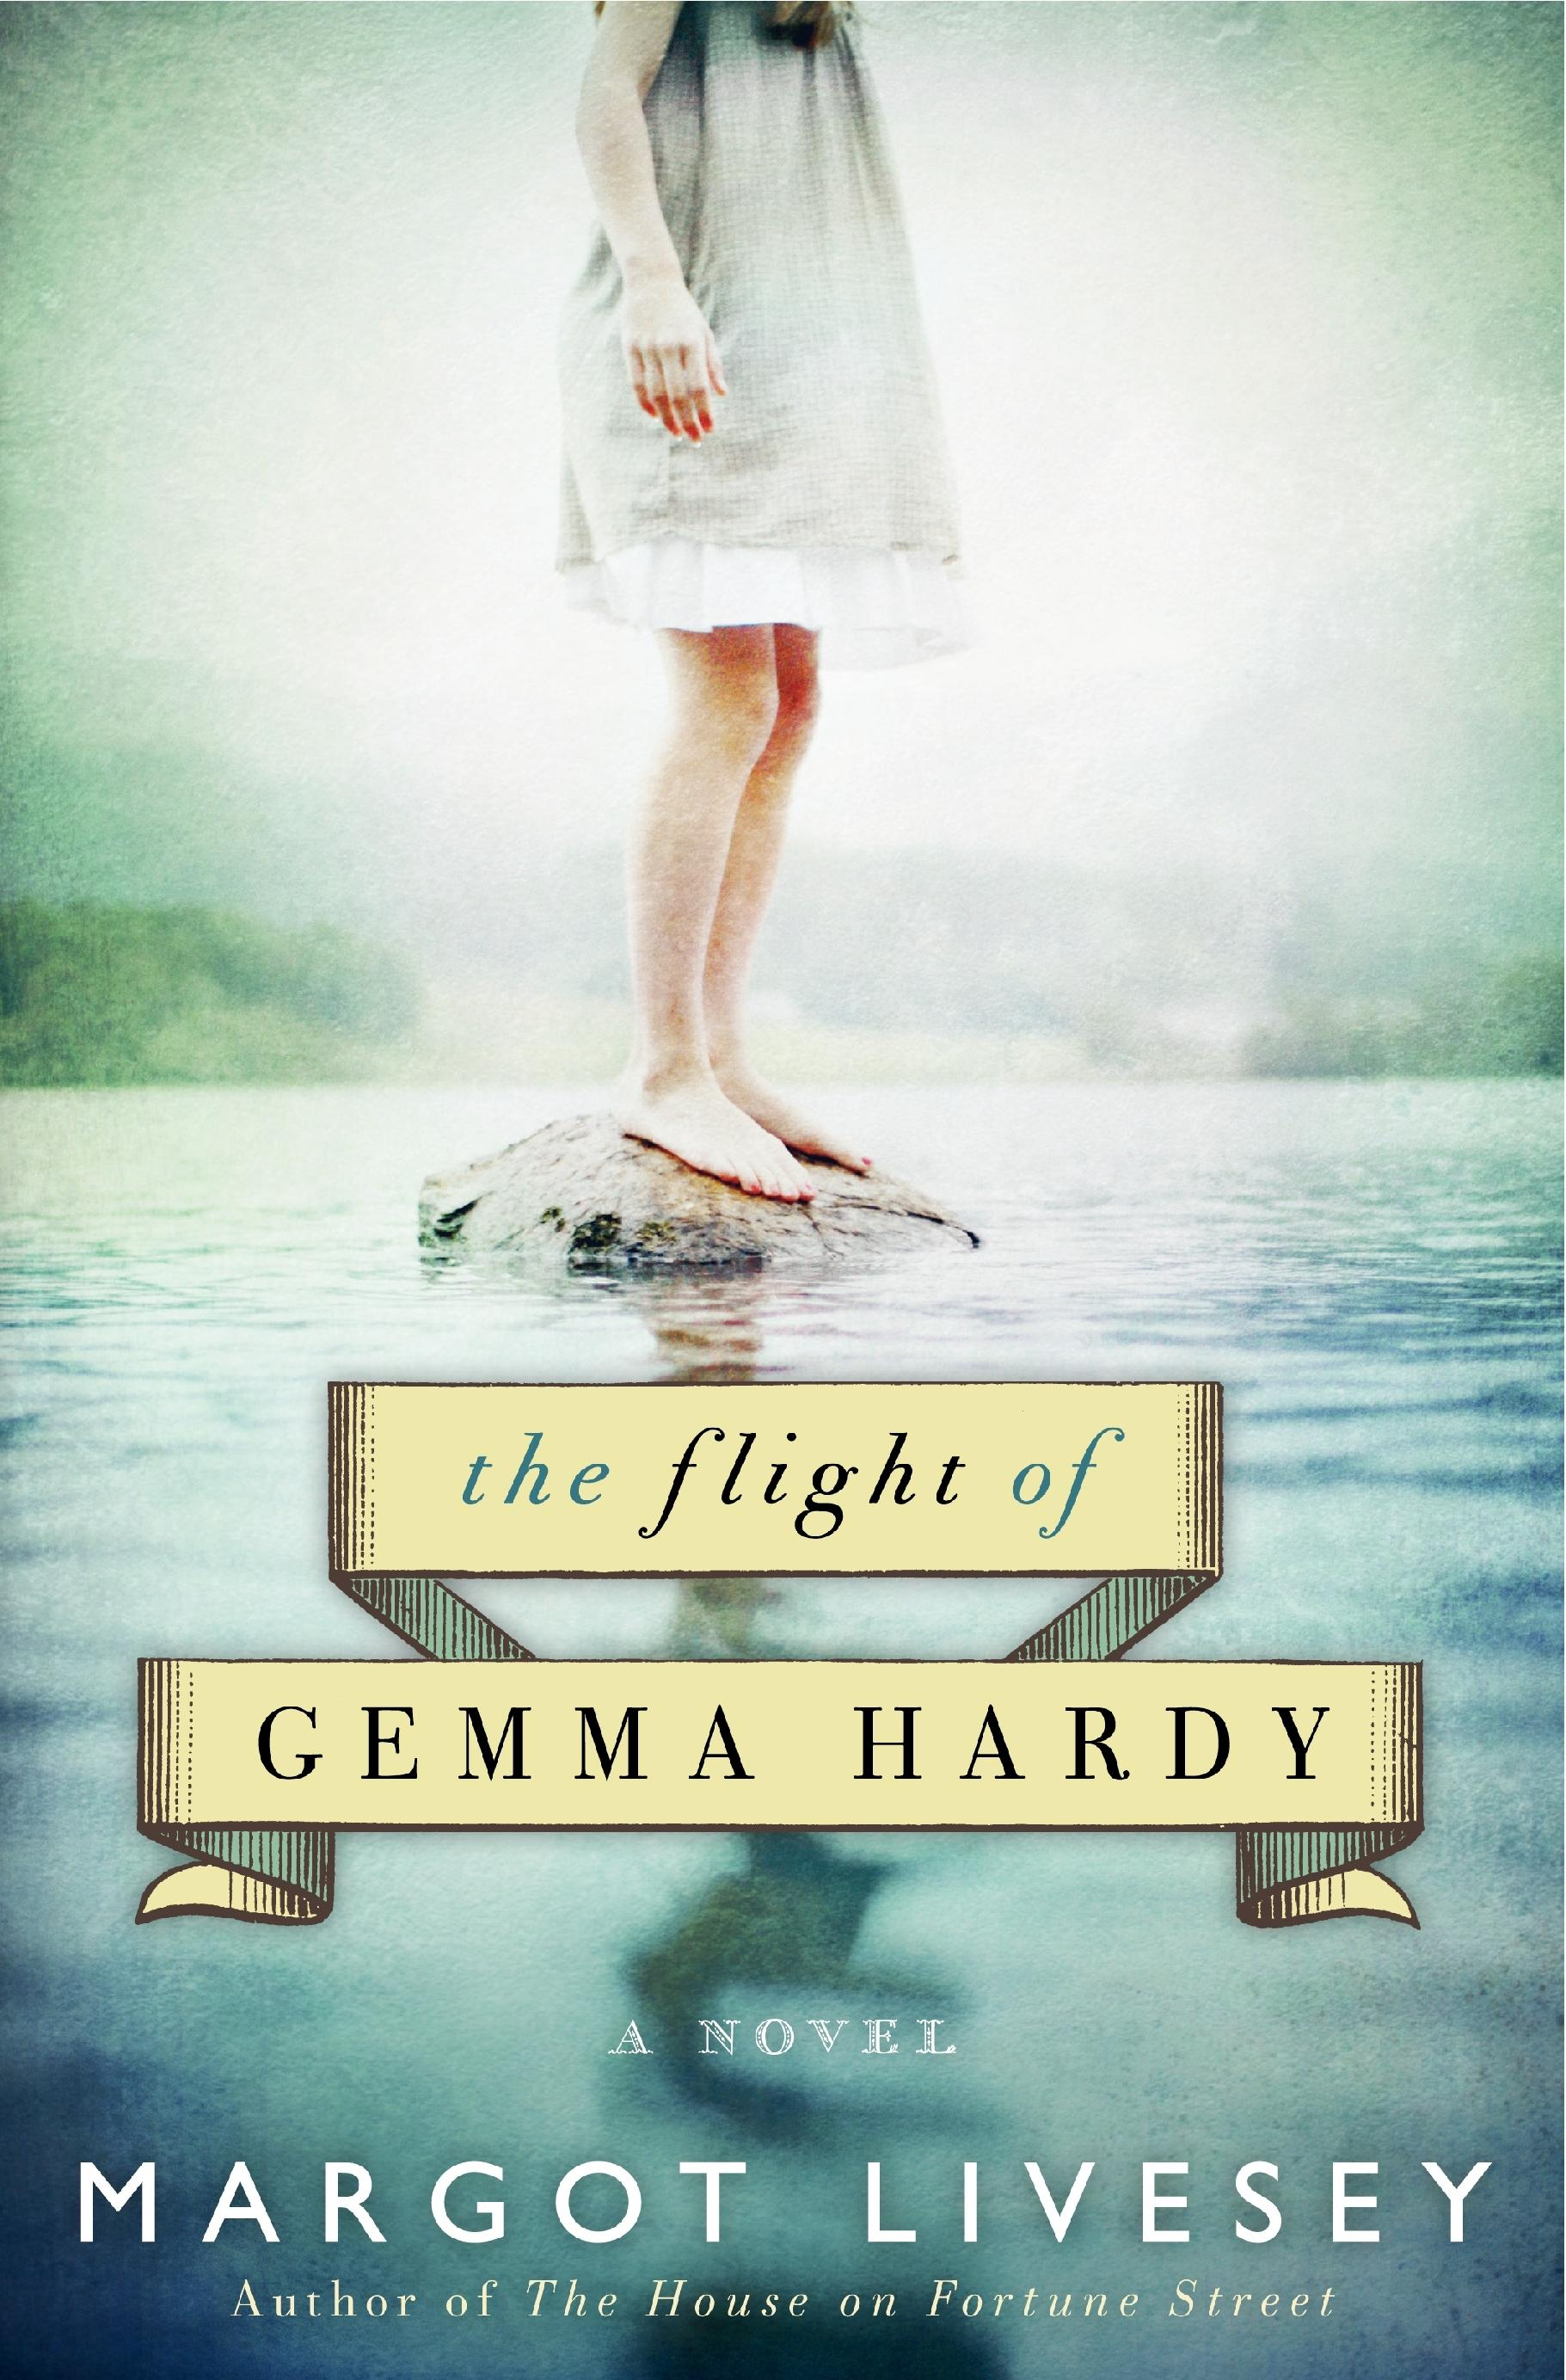 Flight of Gemmy Hardy